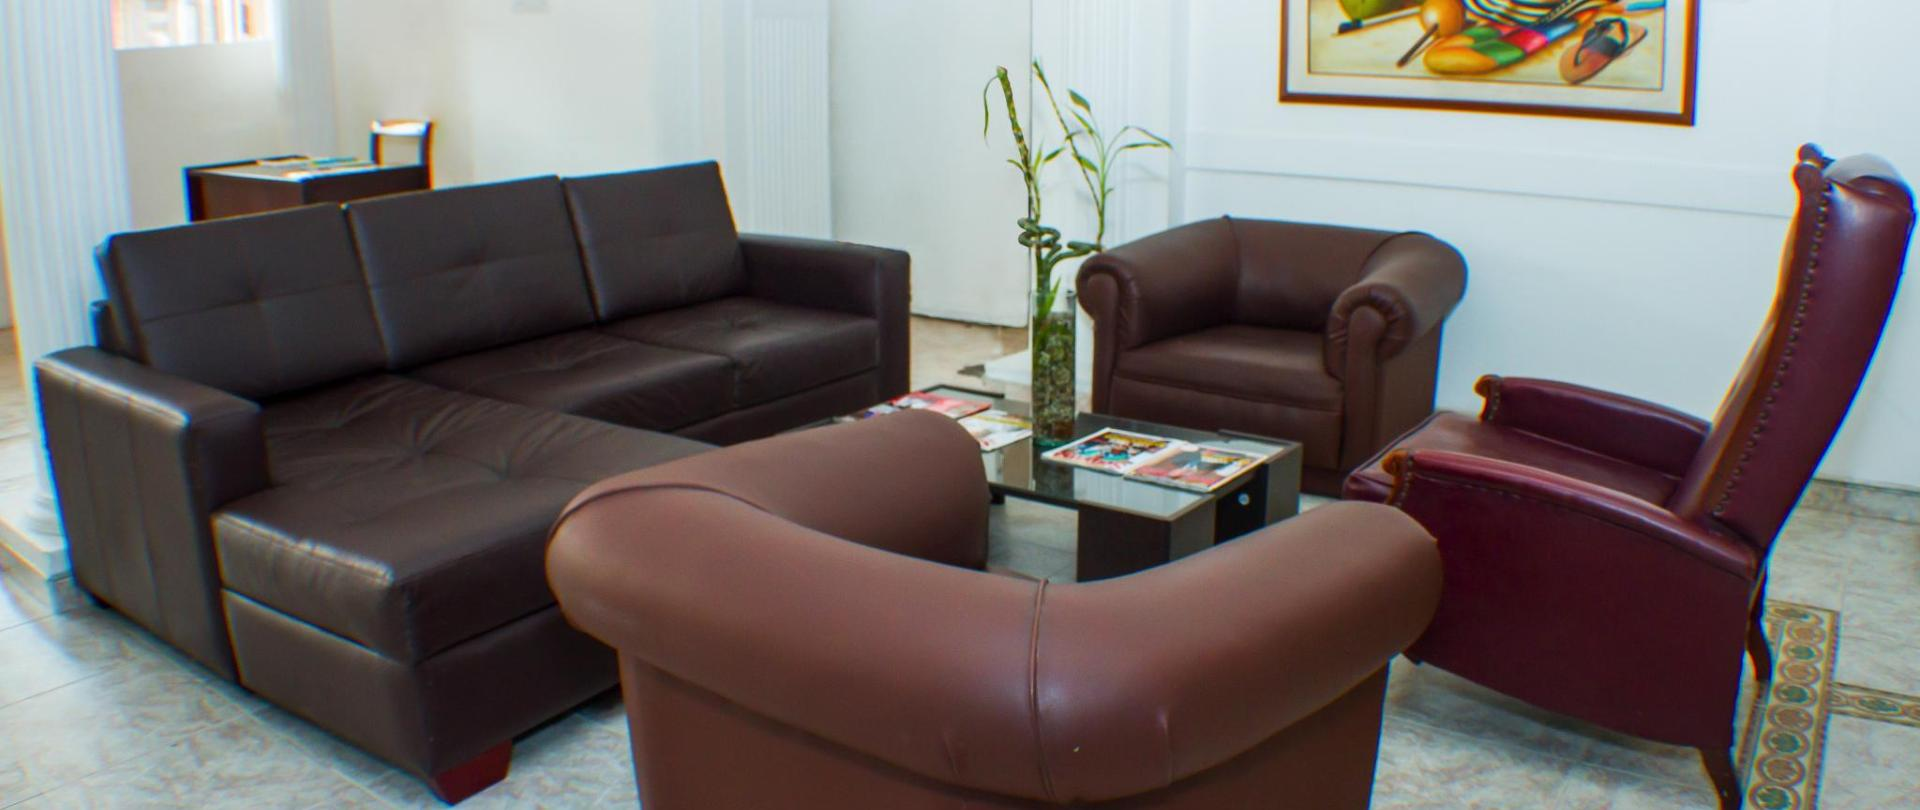 Hotel_Siar-8948.jpg